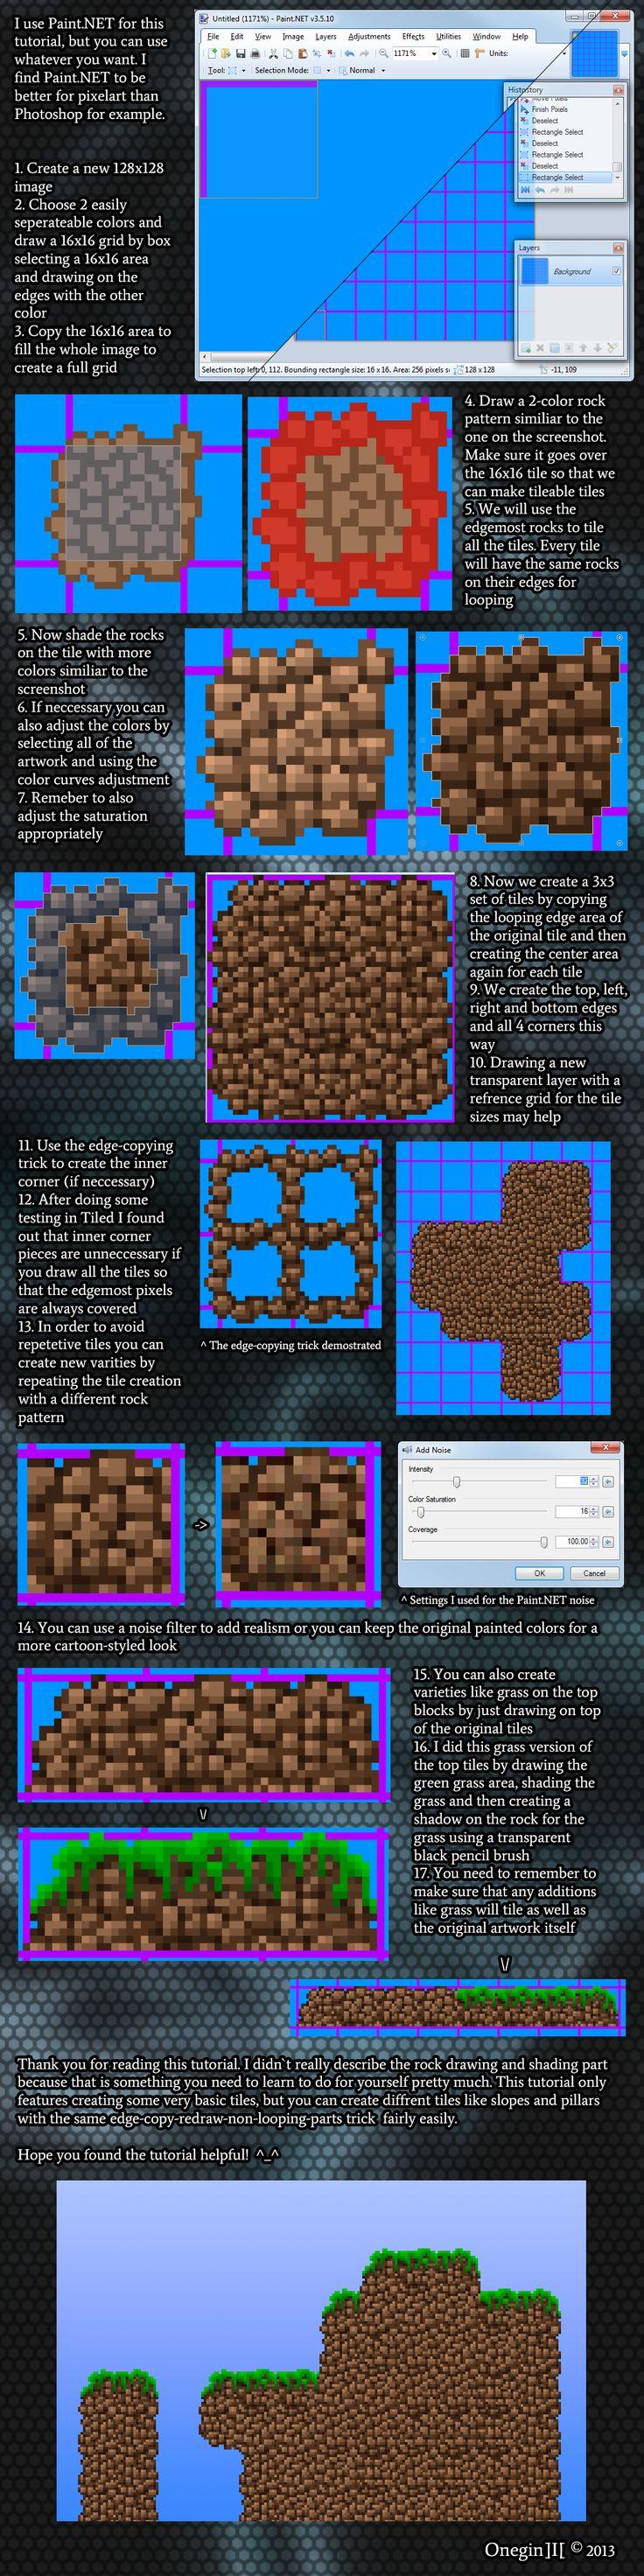 Game maker color blend - 16x16 Pixelart Rock Wall Tileset Tutorial By Oneginiii